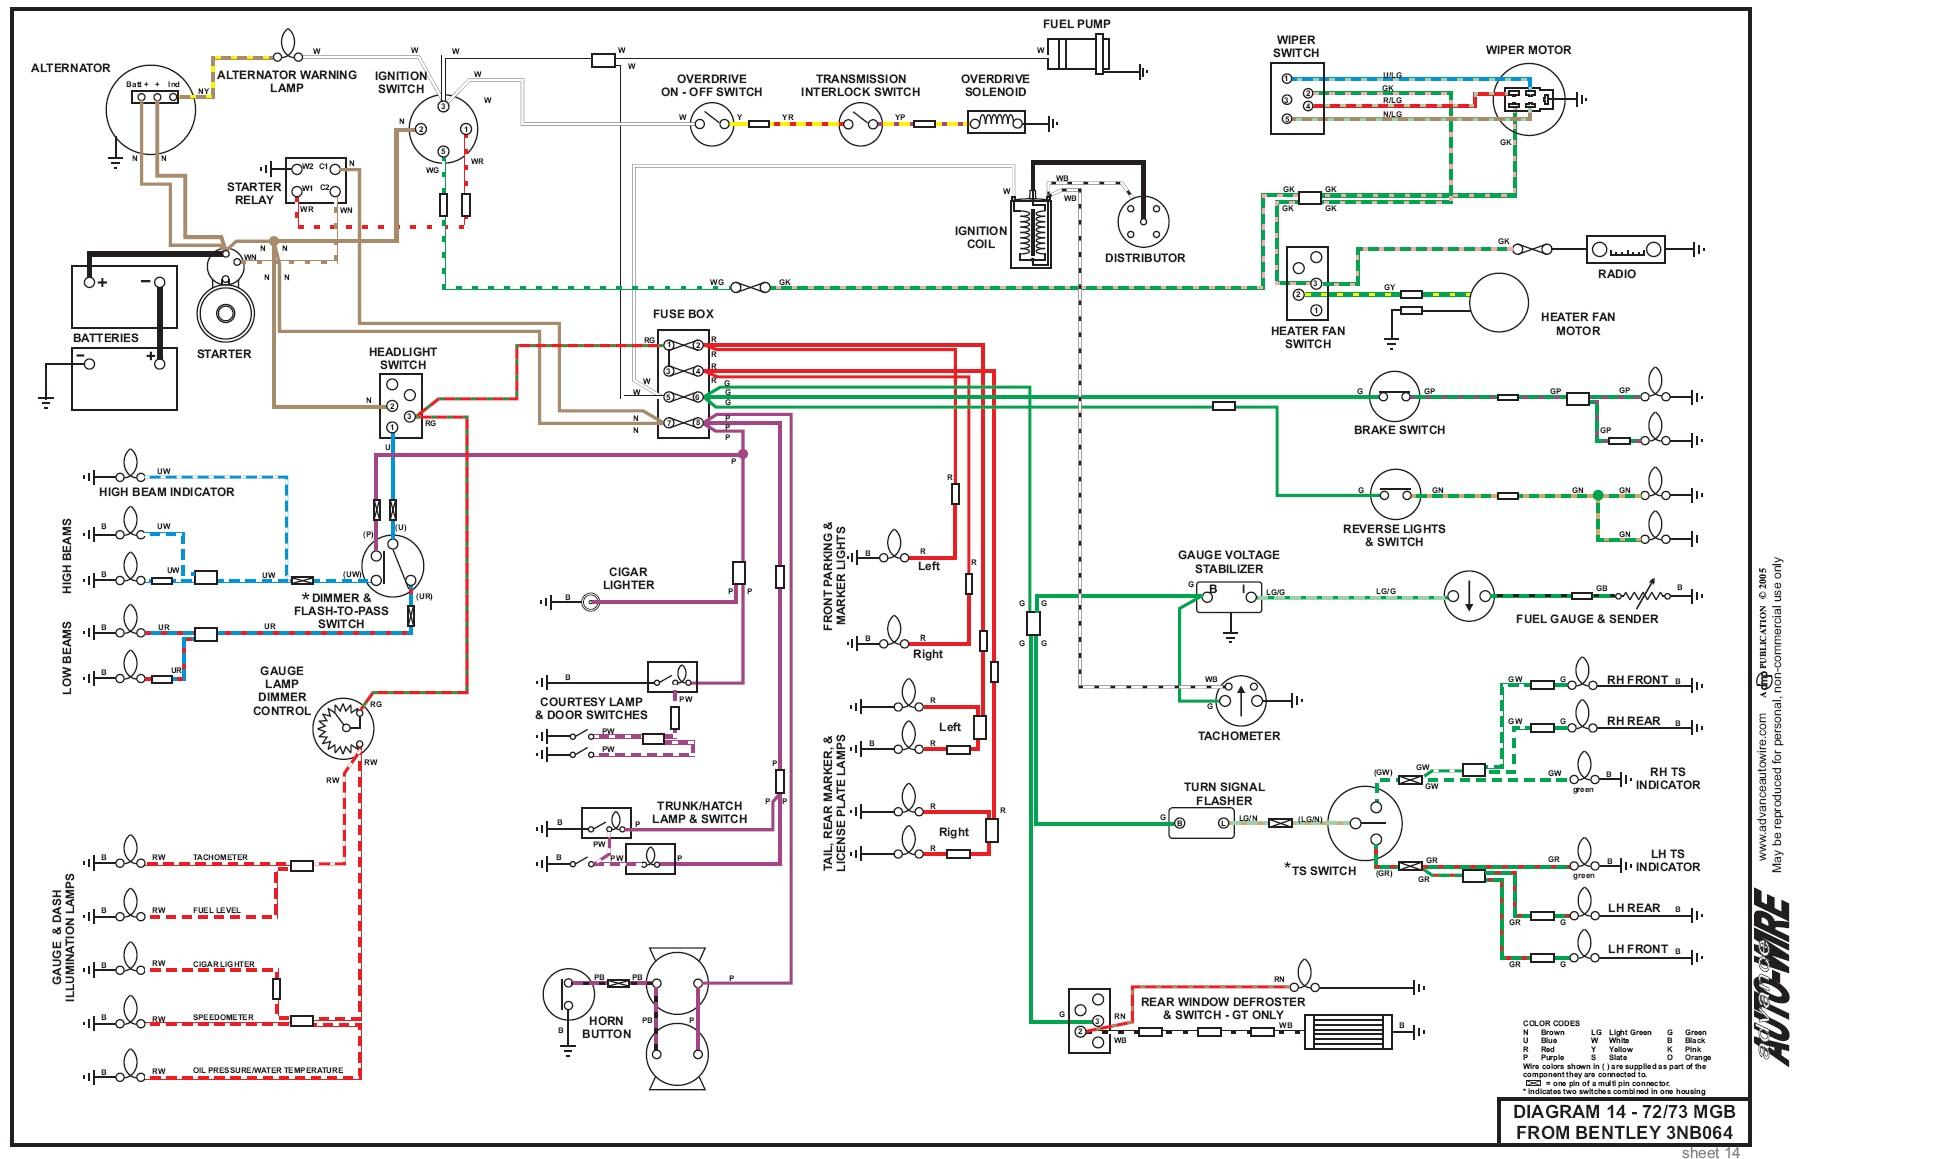 Outstanding 1969 Mgb Ignition Wiring Diagram Wiring Diagram Wiring Cloud Lukepaidewilluminateatxorg